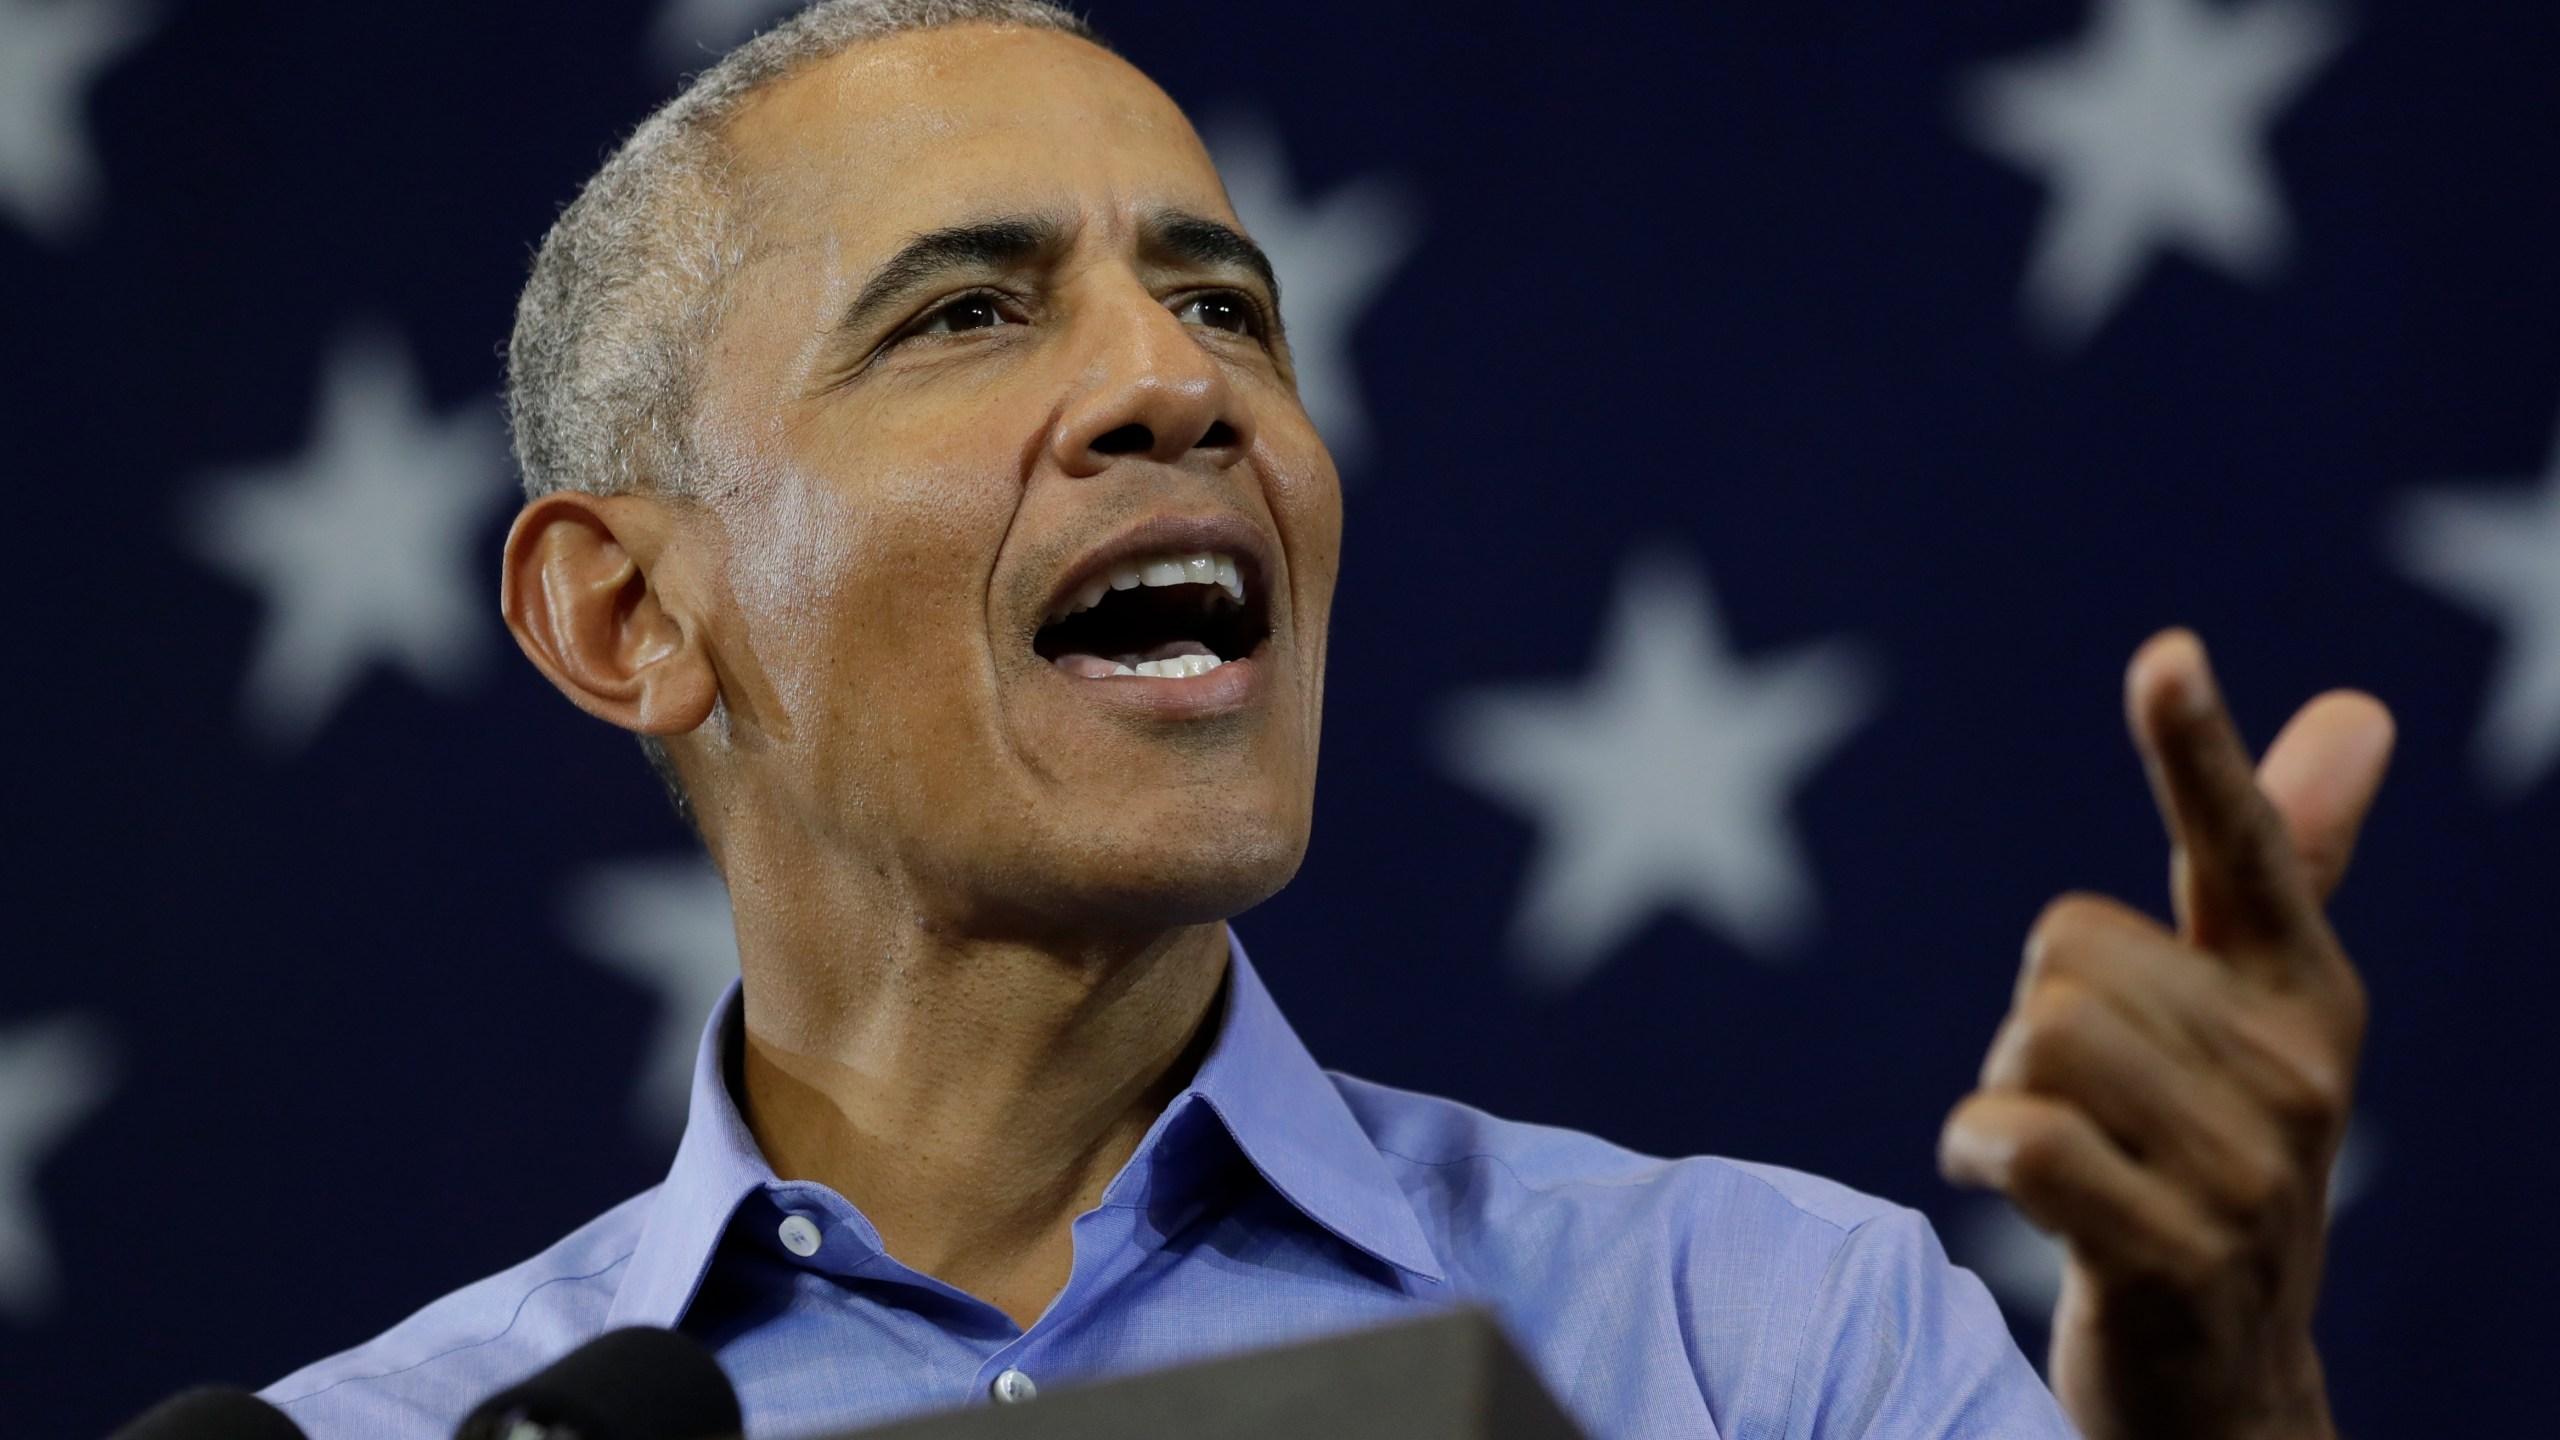 Election_2018_Wisconsin_Obama_06873-159532.jpg67308299